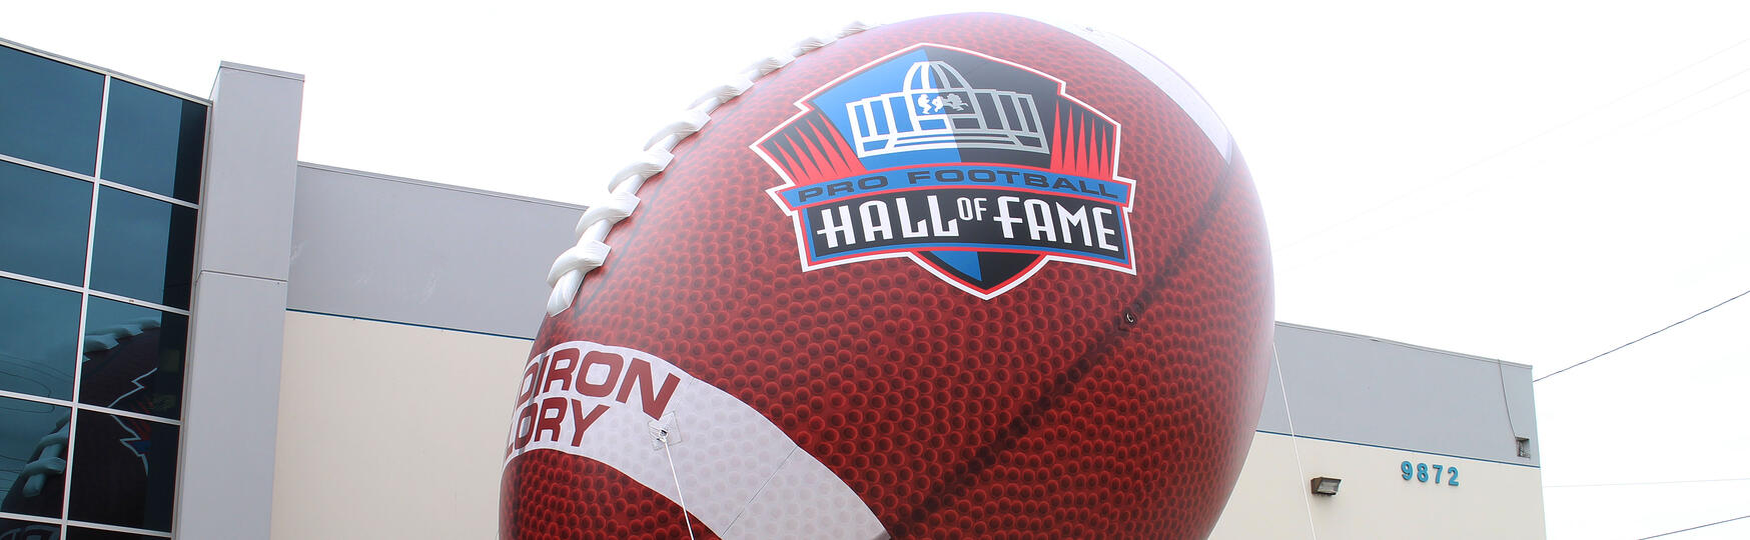 huge-inflatable-football-header.jpg